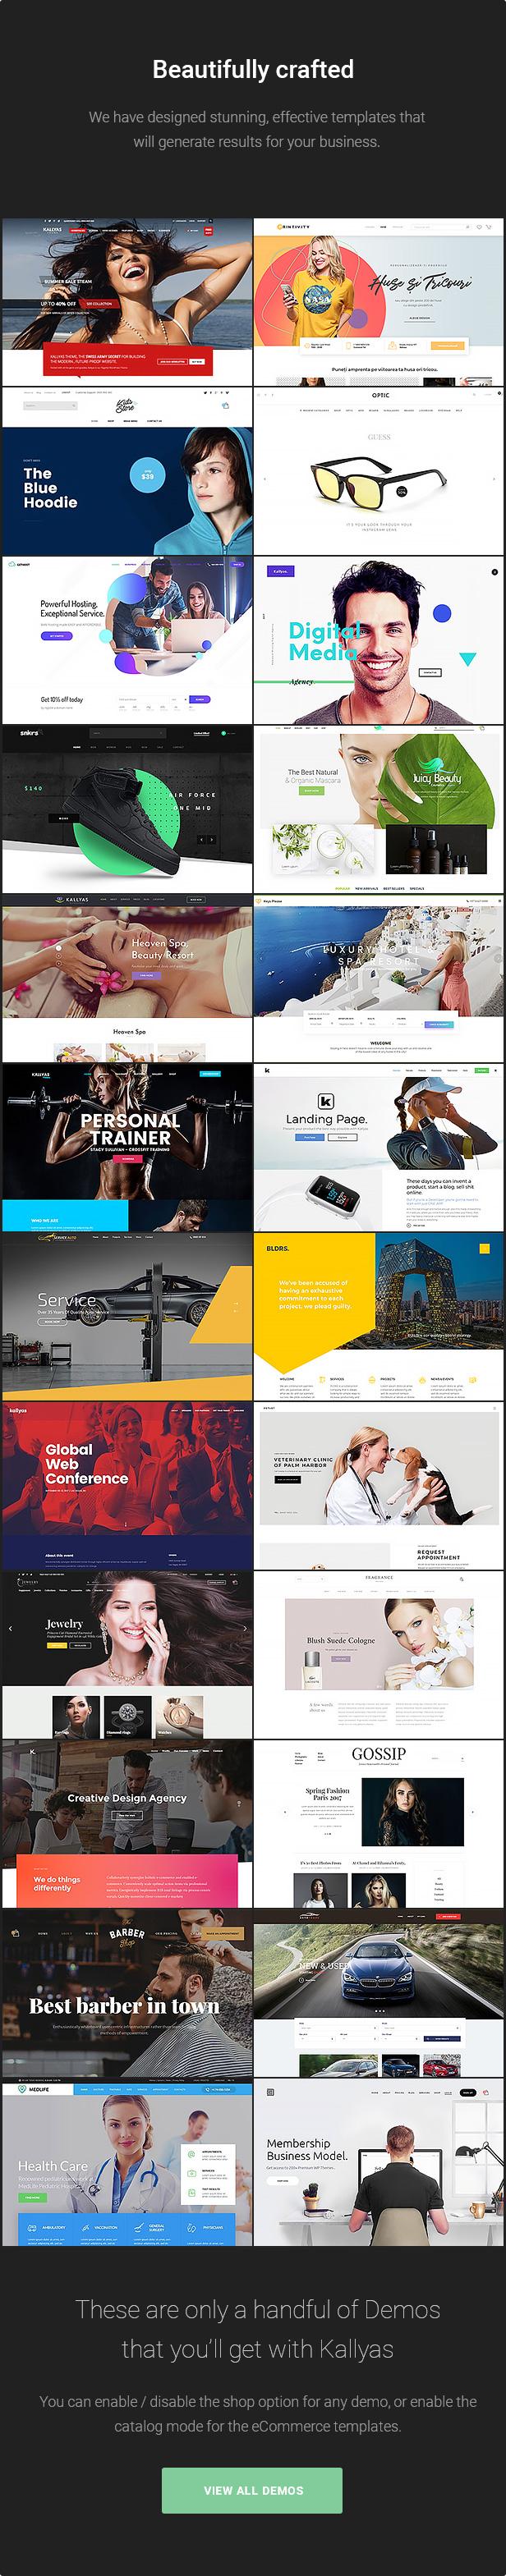 14.beautiful designs - KALLYAS - Creative eCommerce Multi-Purpose WordPress Theme